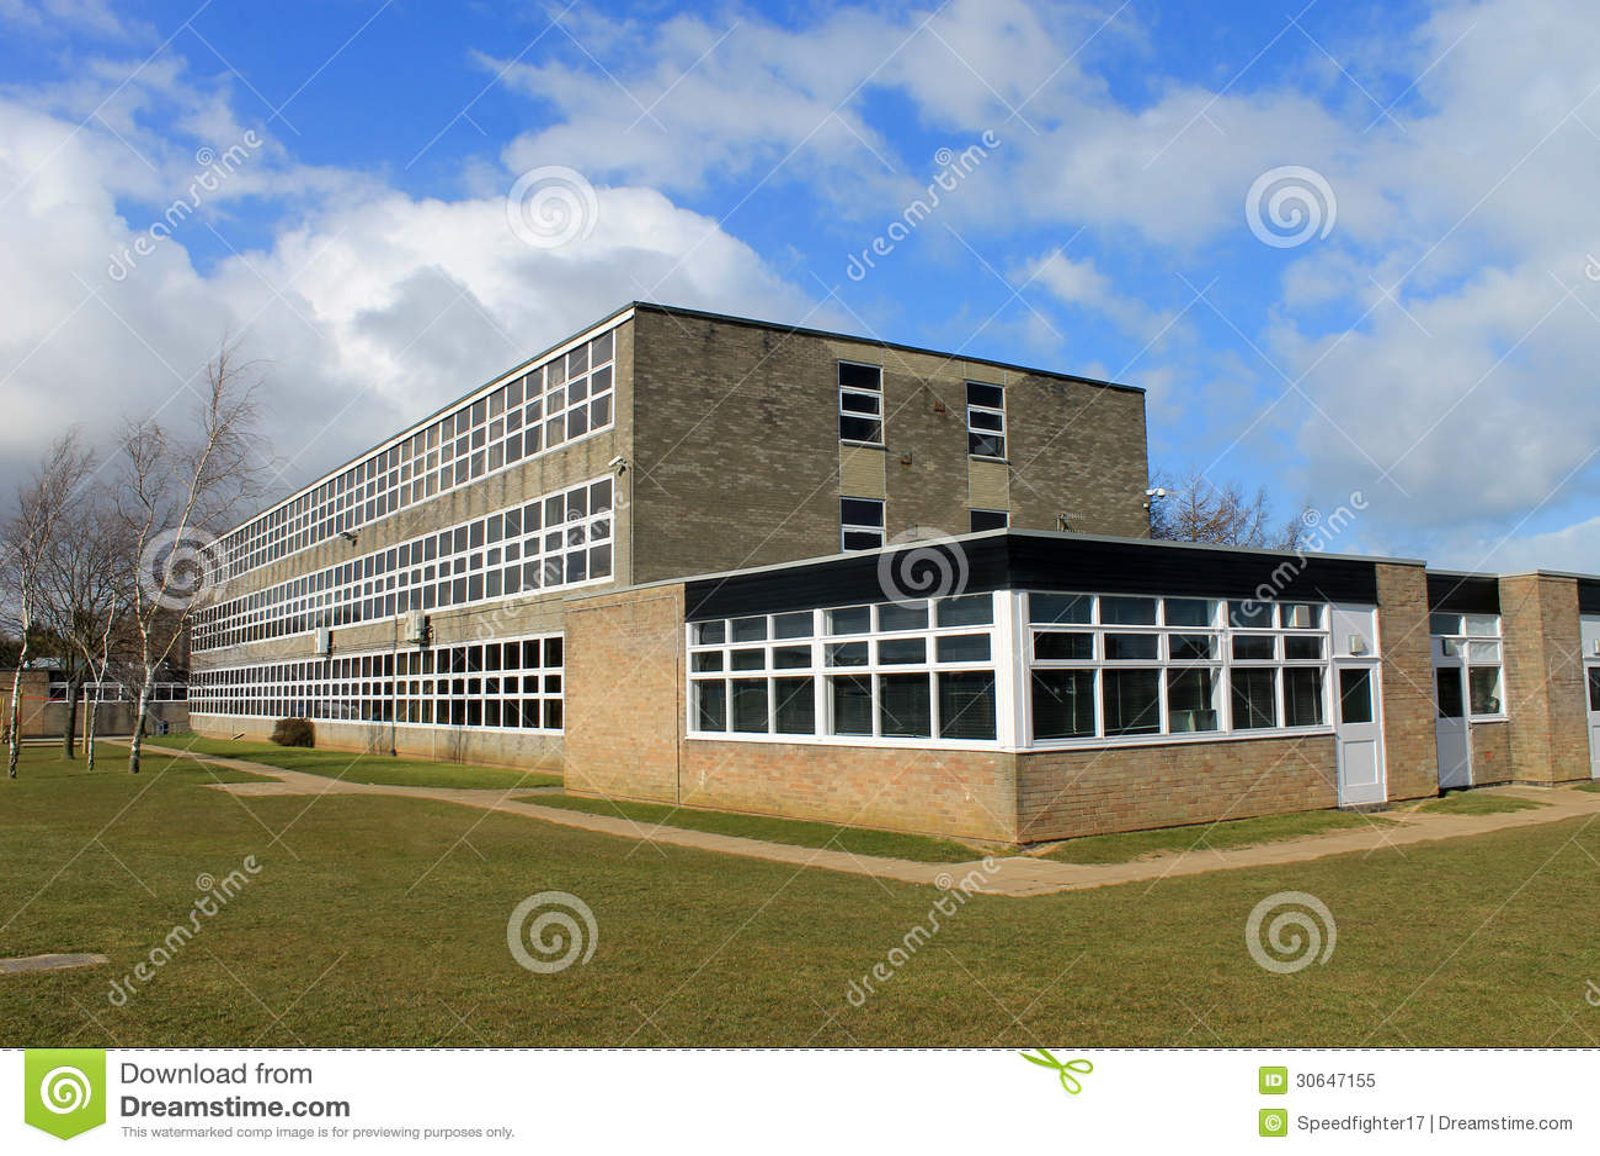 English School Building Stock Image Image Of Grass